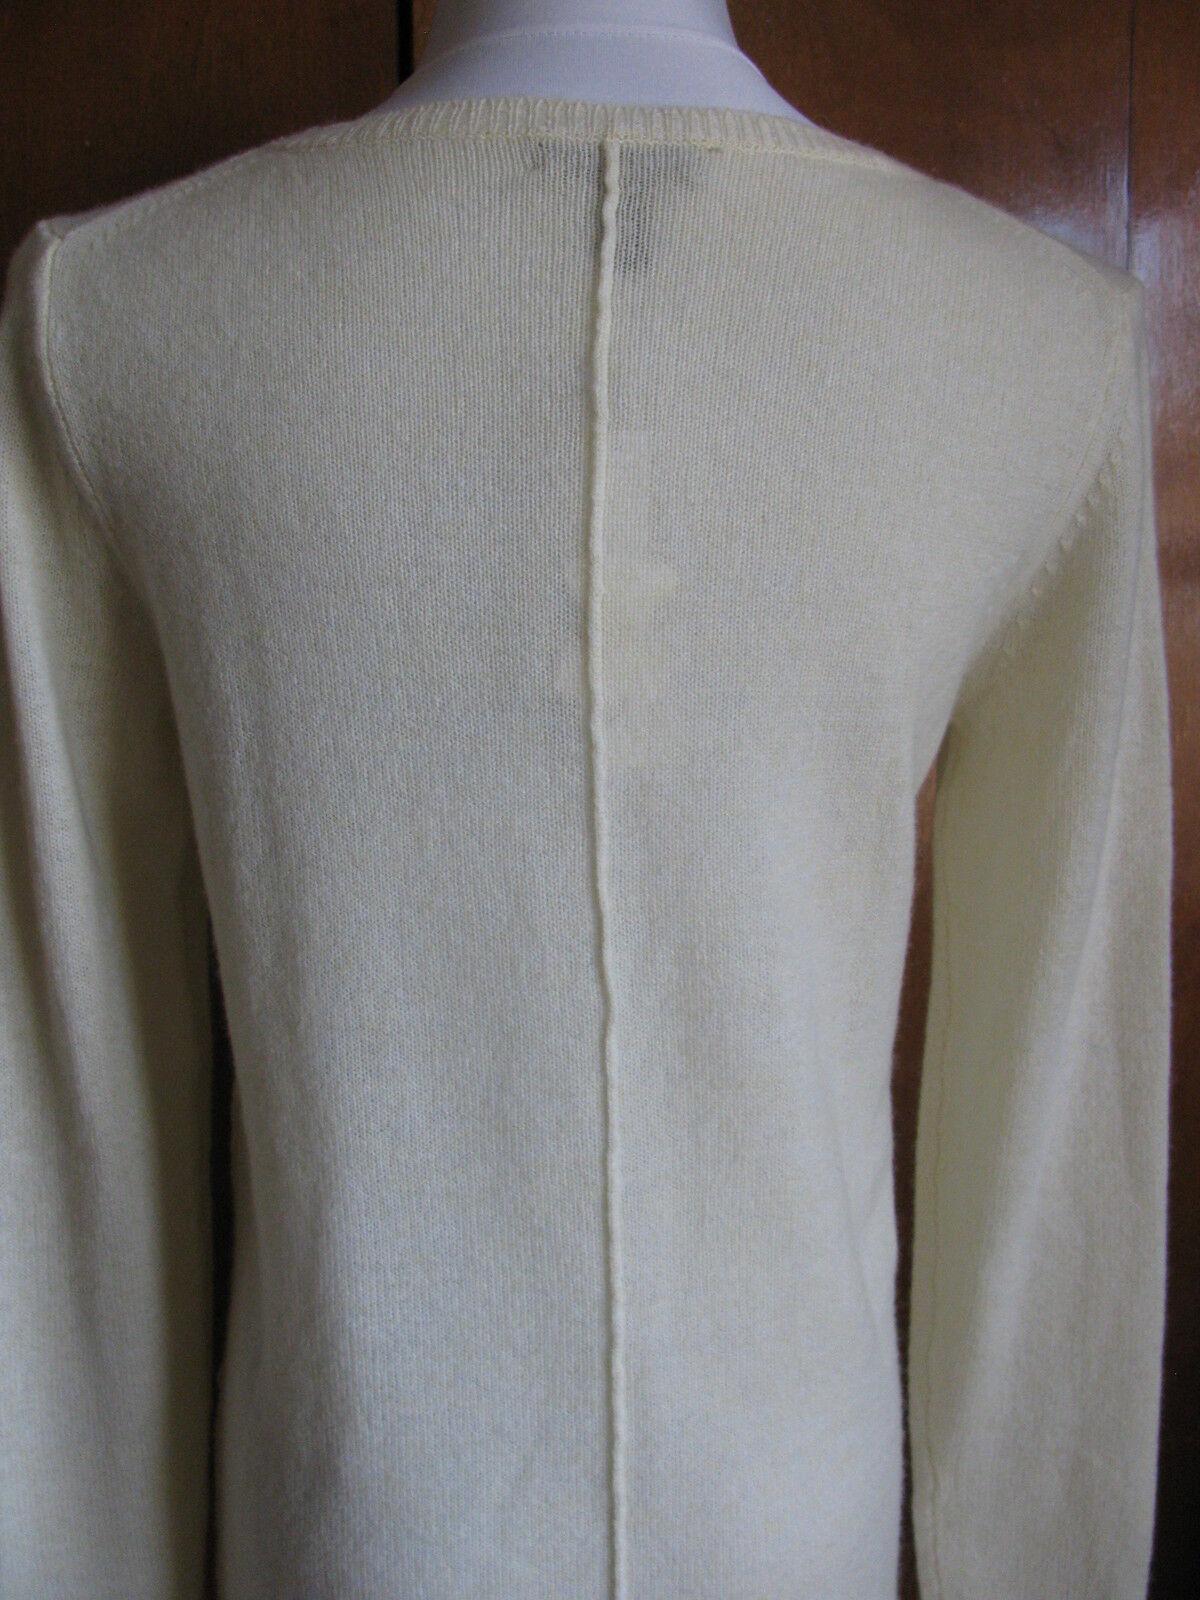 Aqua Women's Lemon Lemon Lemon Ice Sweater Size Large NWT e1d67a